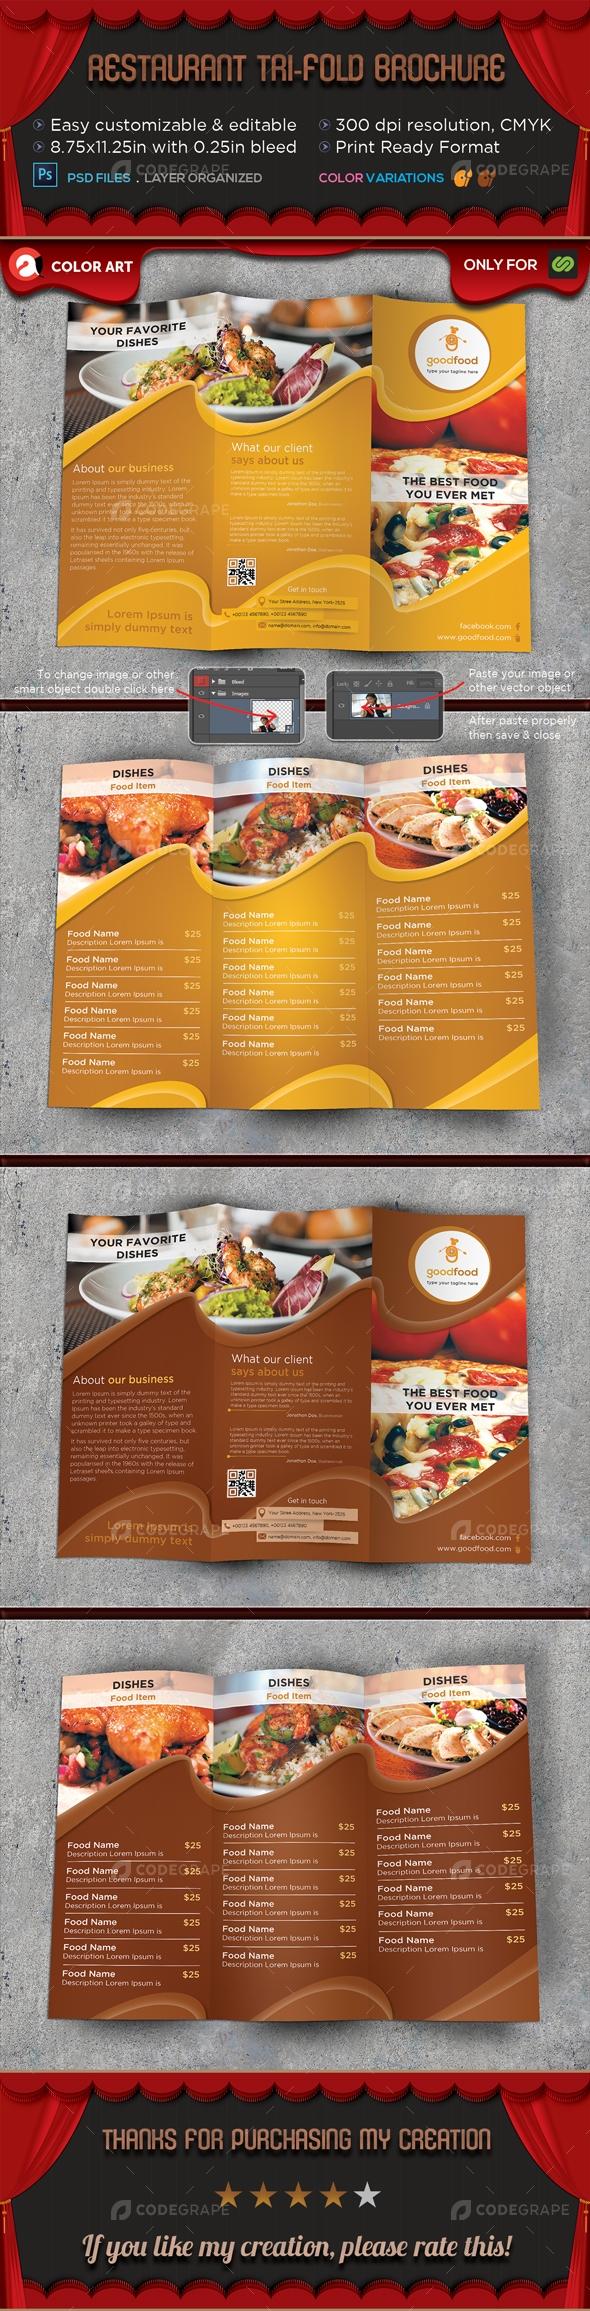 Restaurant Tri-fold Brochure V.4